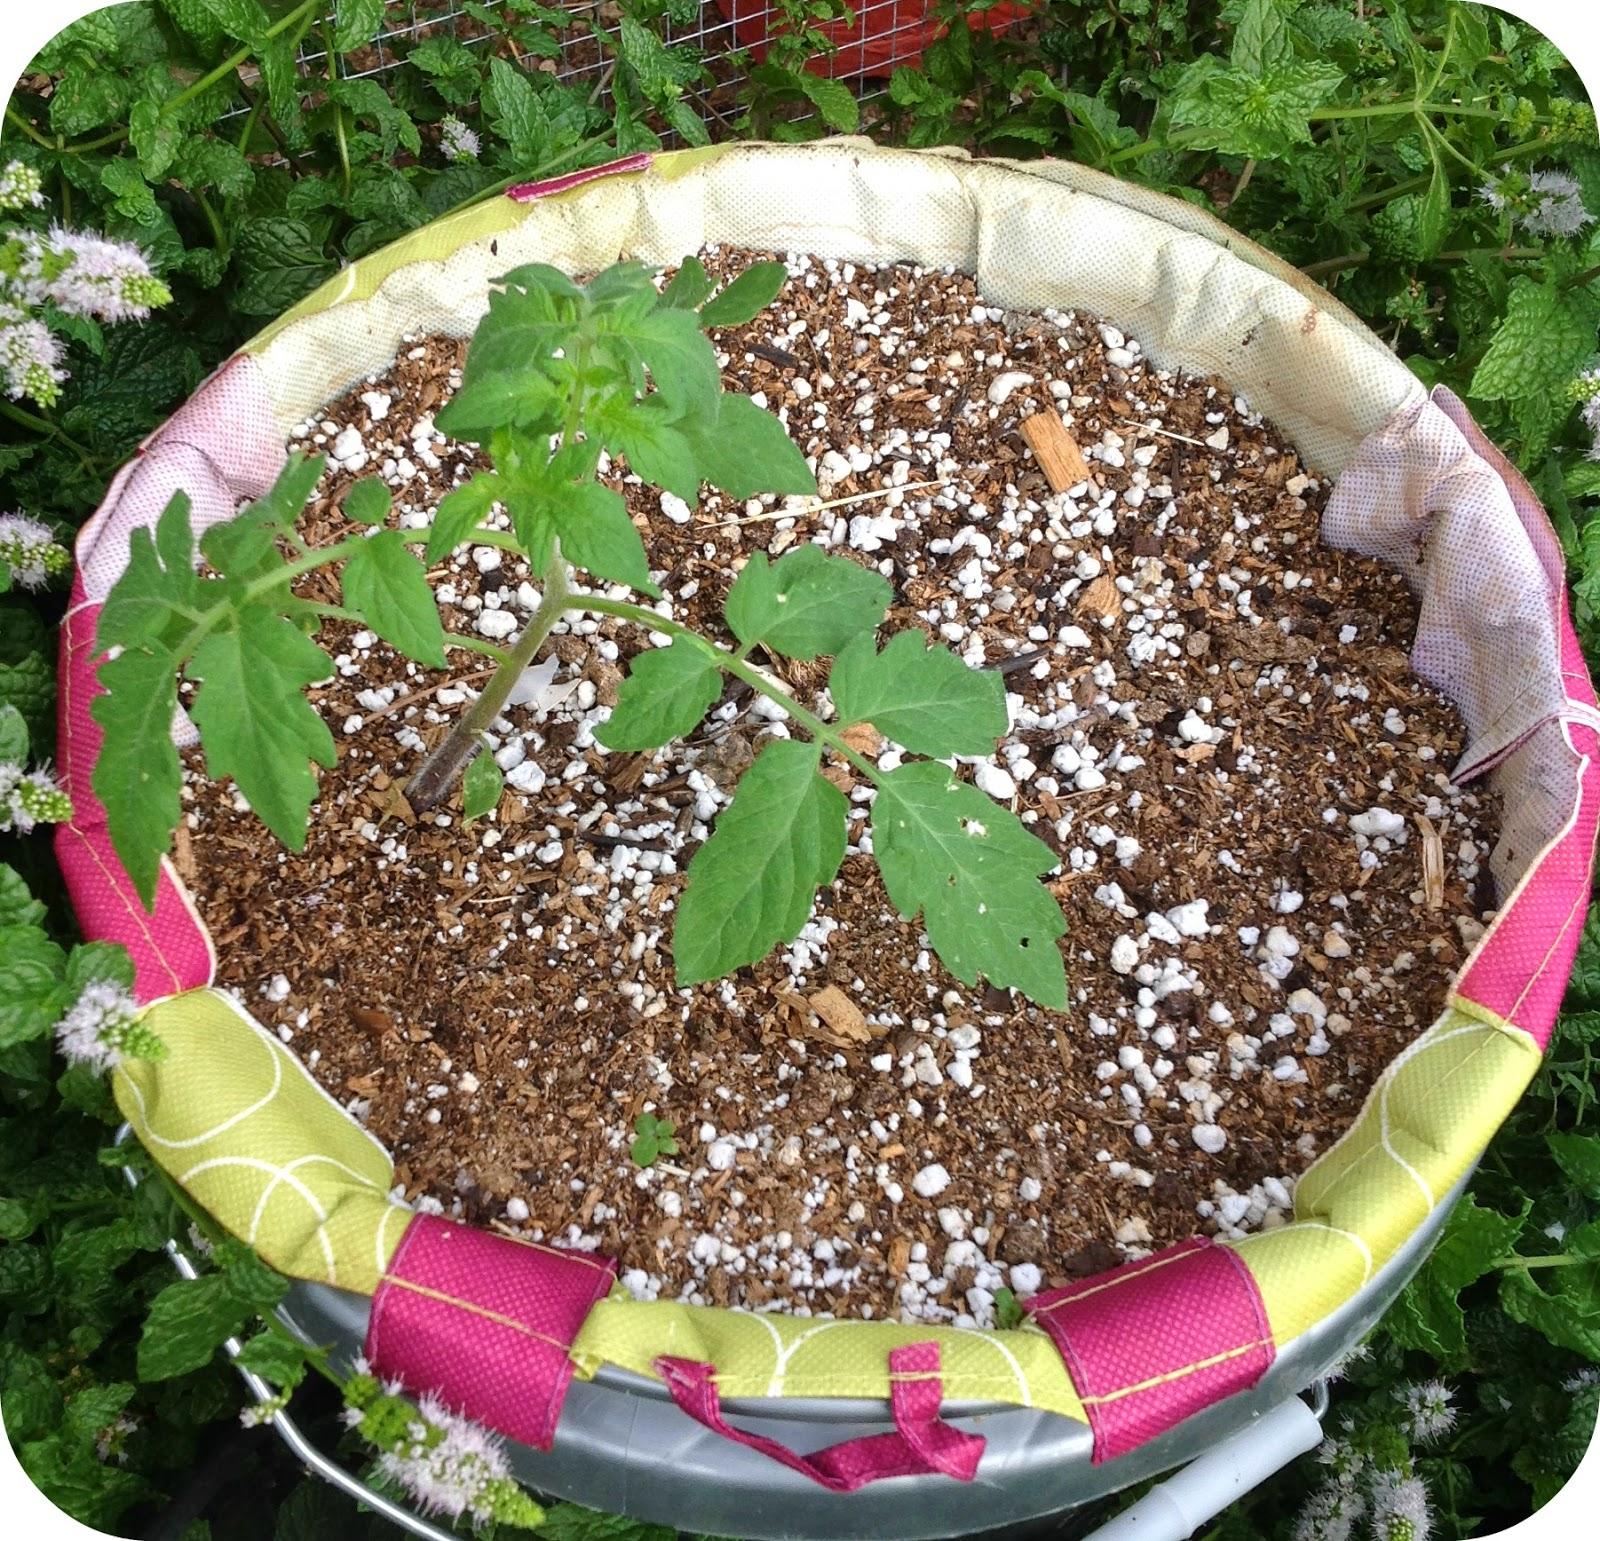 http://backyardchickenlady.blogspot.com/2014/09/discovery-of-volunteer-tomato-plant-in.html